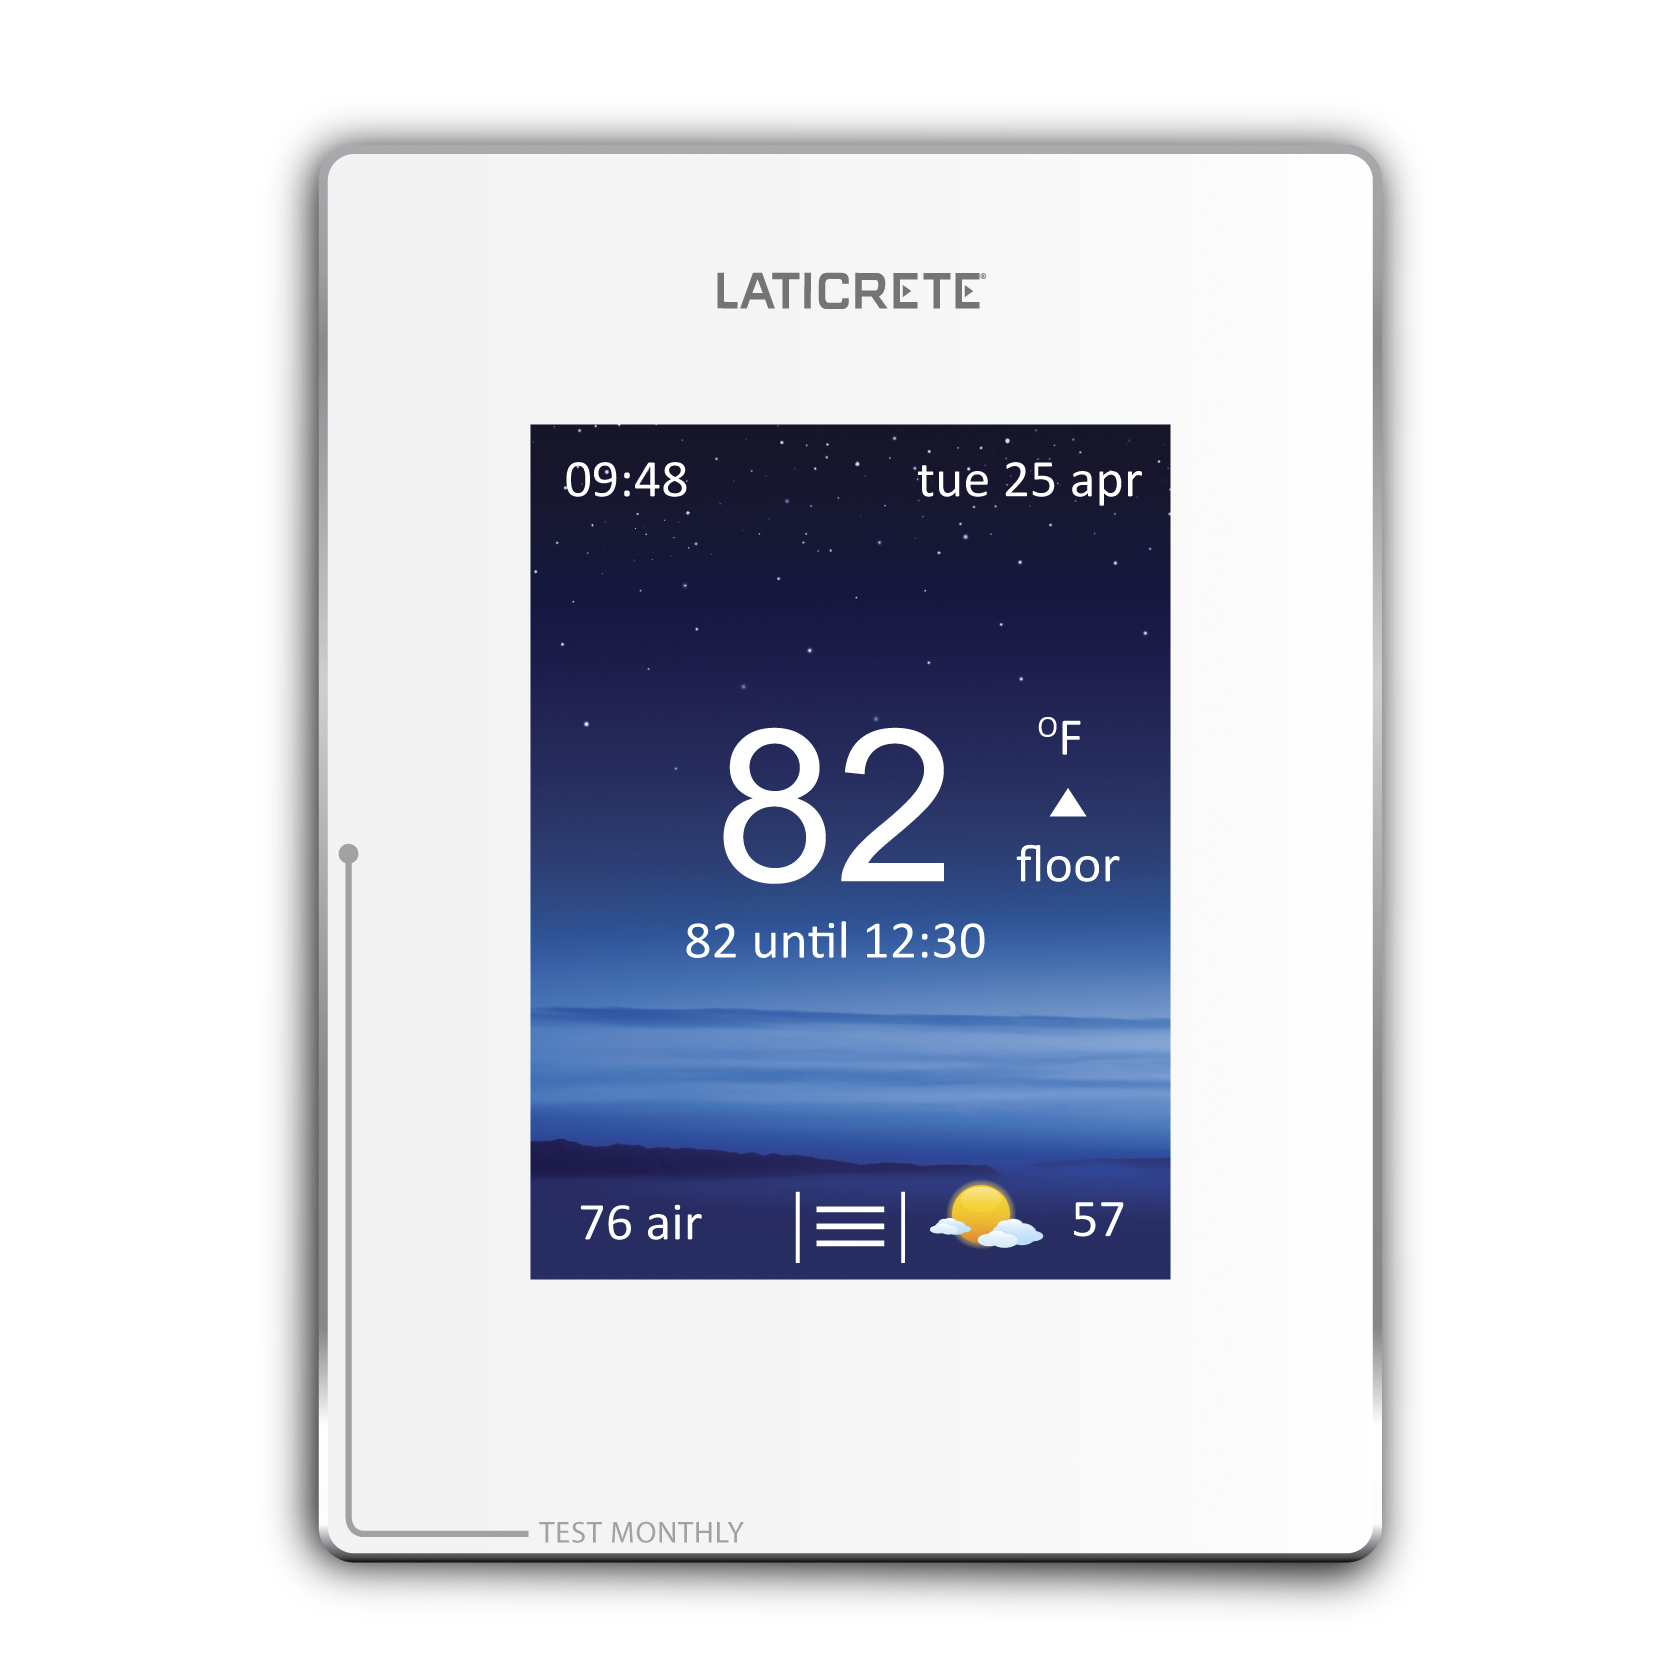 strata heat thermostat laticrete rh laticrete com Line Voltage Thermostat Electric Heat Thermostat